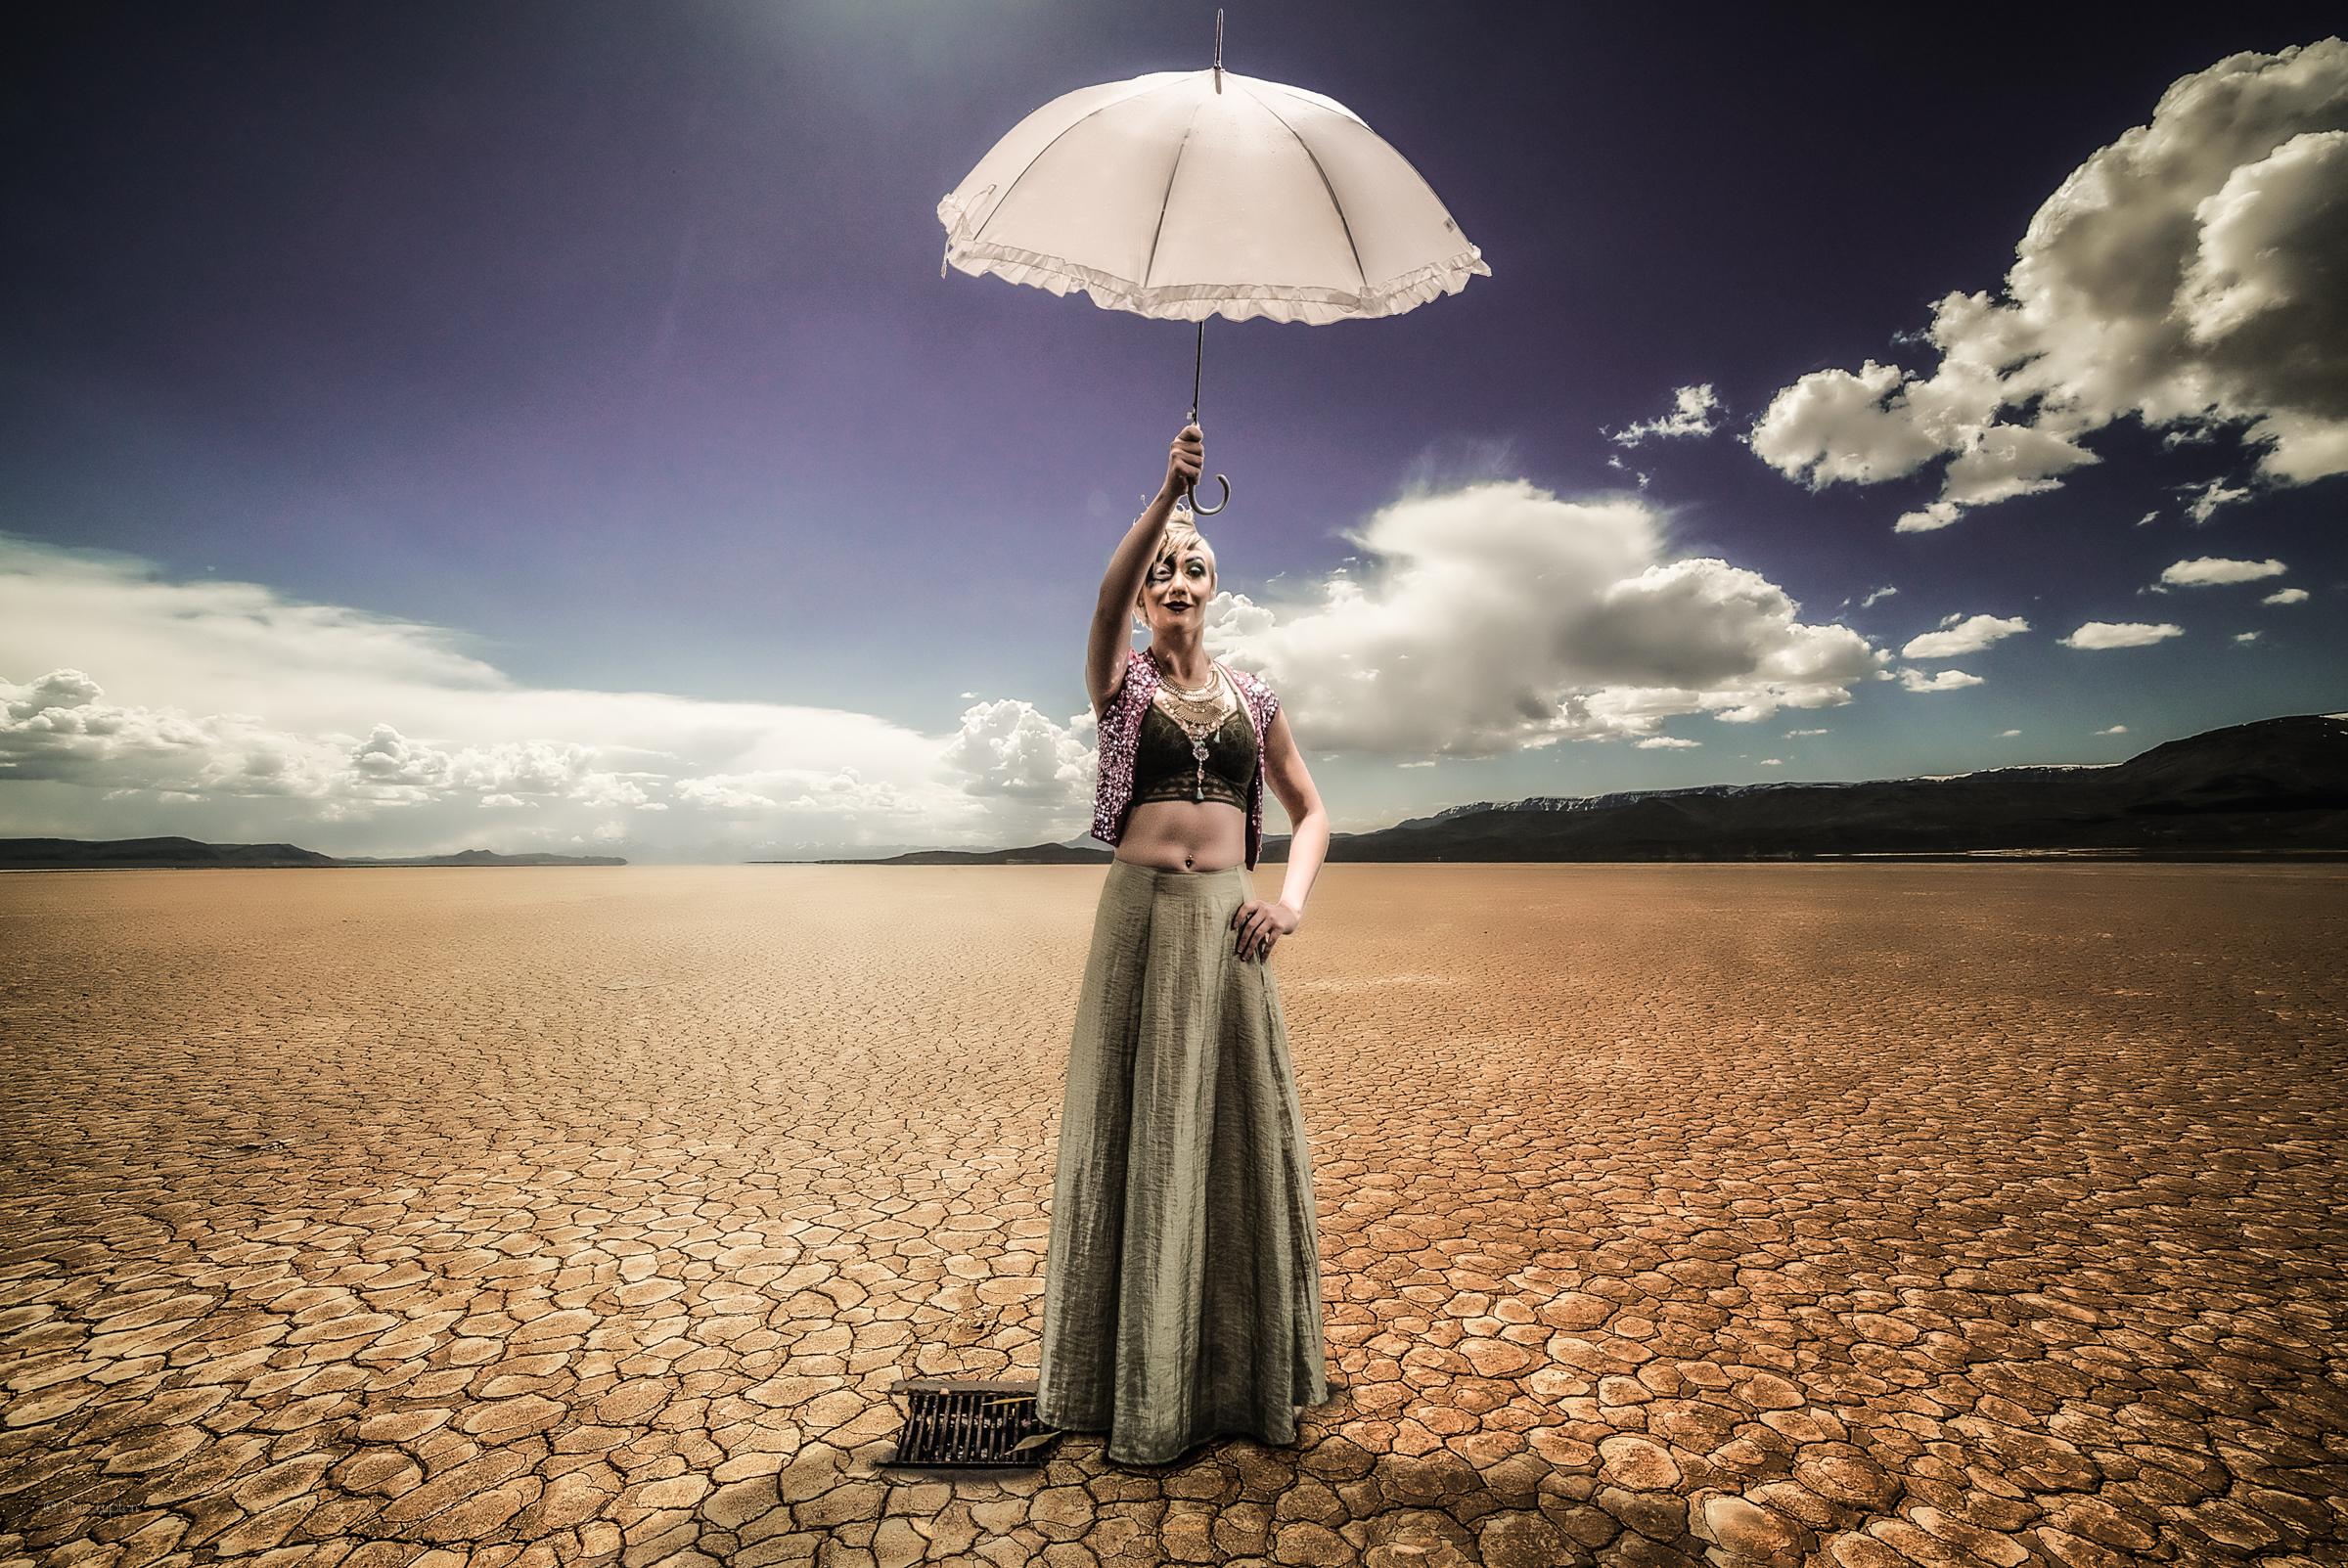 Tom_Lupton_Photos_Umbrella_Portrait.jpg